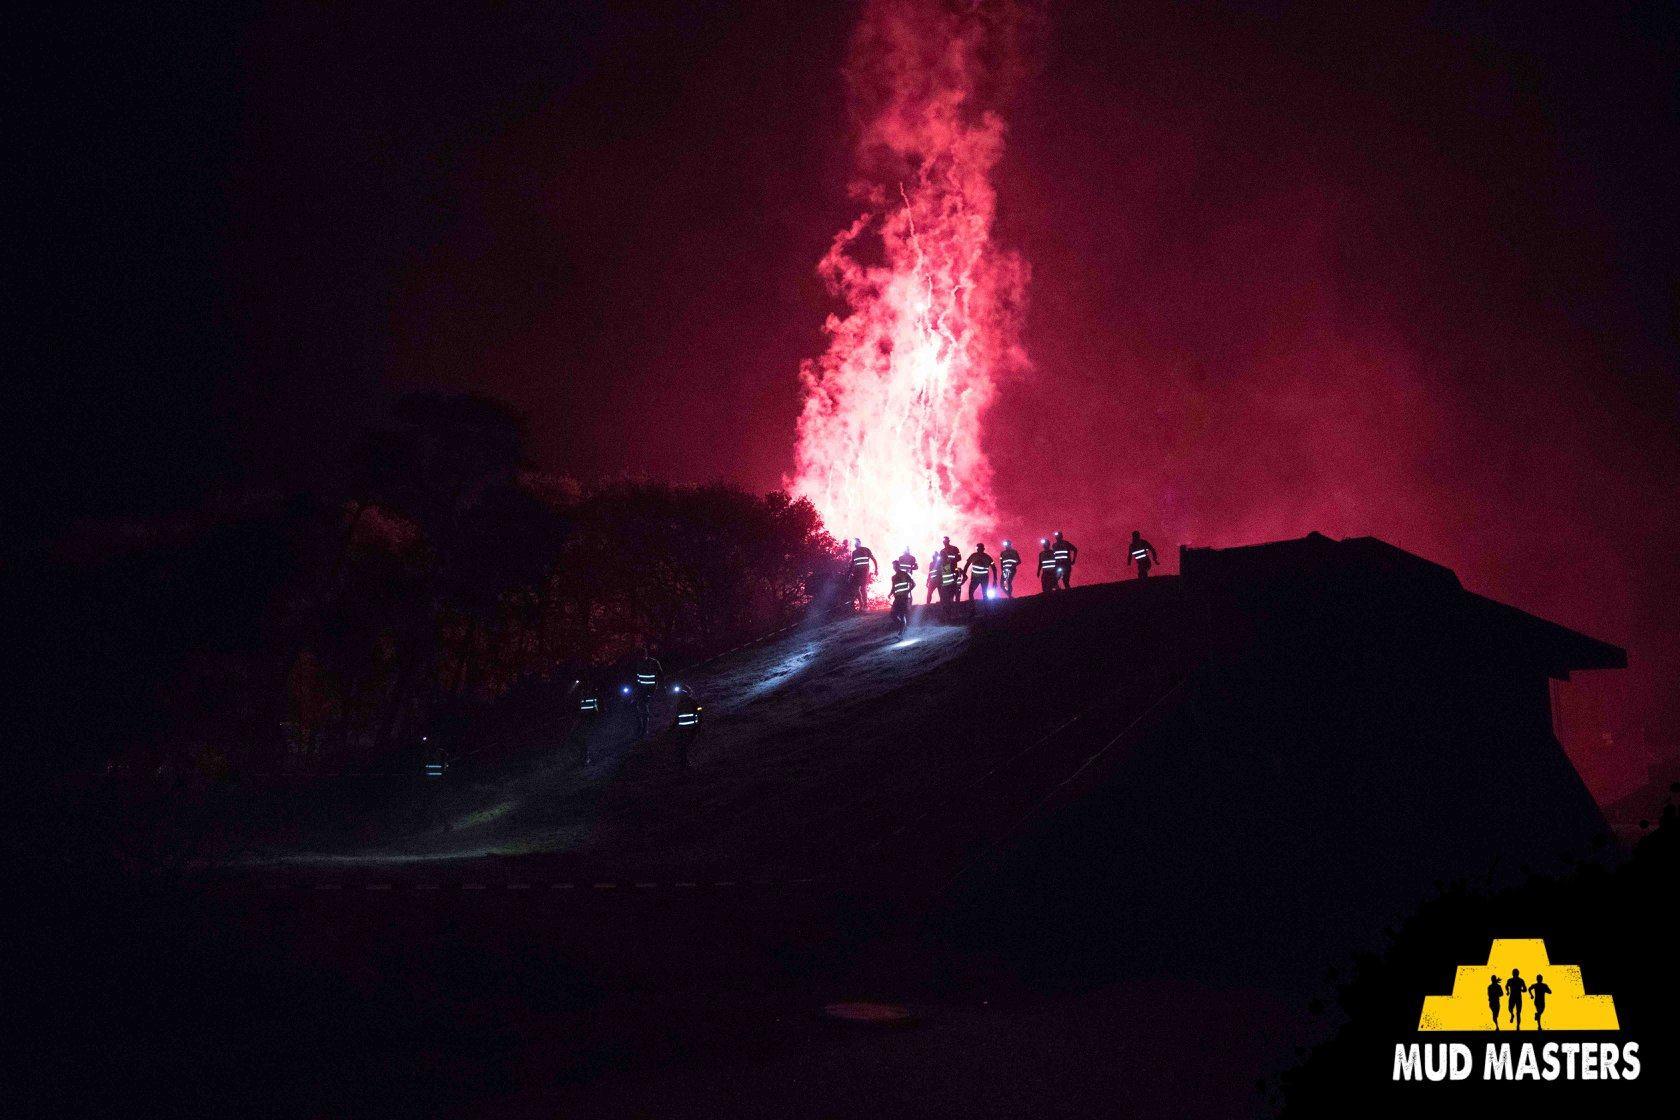 Mud Masters Obstacle Run Night Shift, Hindernislauf Deutschland, Hindernis Bunker Busters Feuerwerk